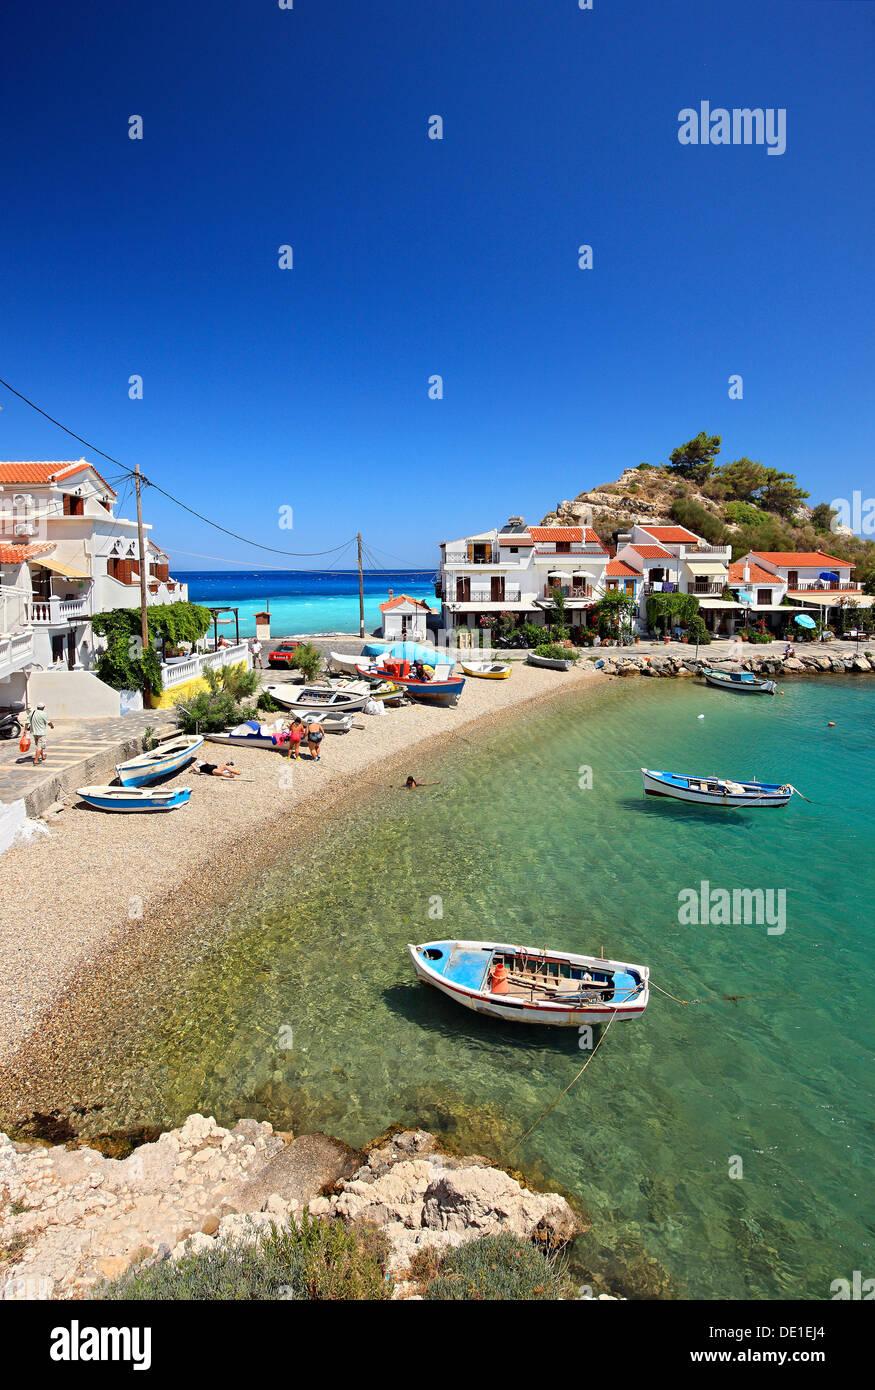 Kokkari village, one of the most popular tourist destinations in Samos island, Greece. - Stock Image